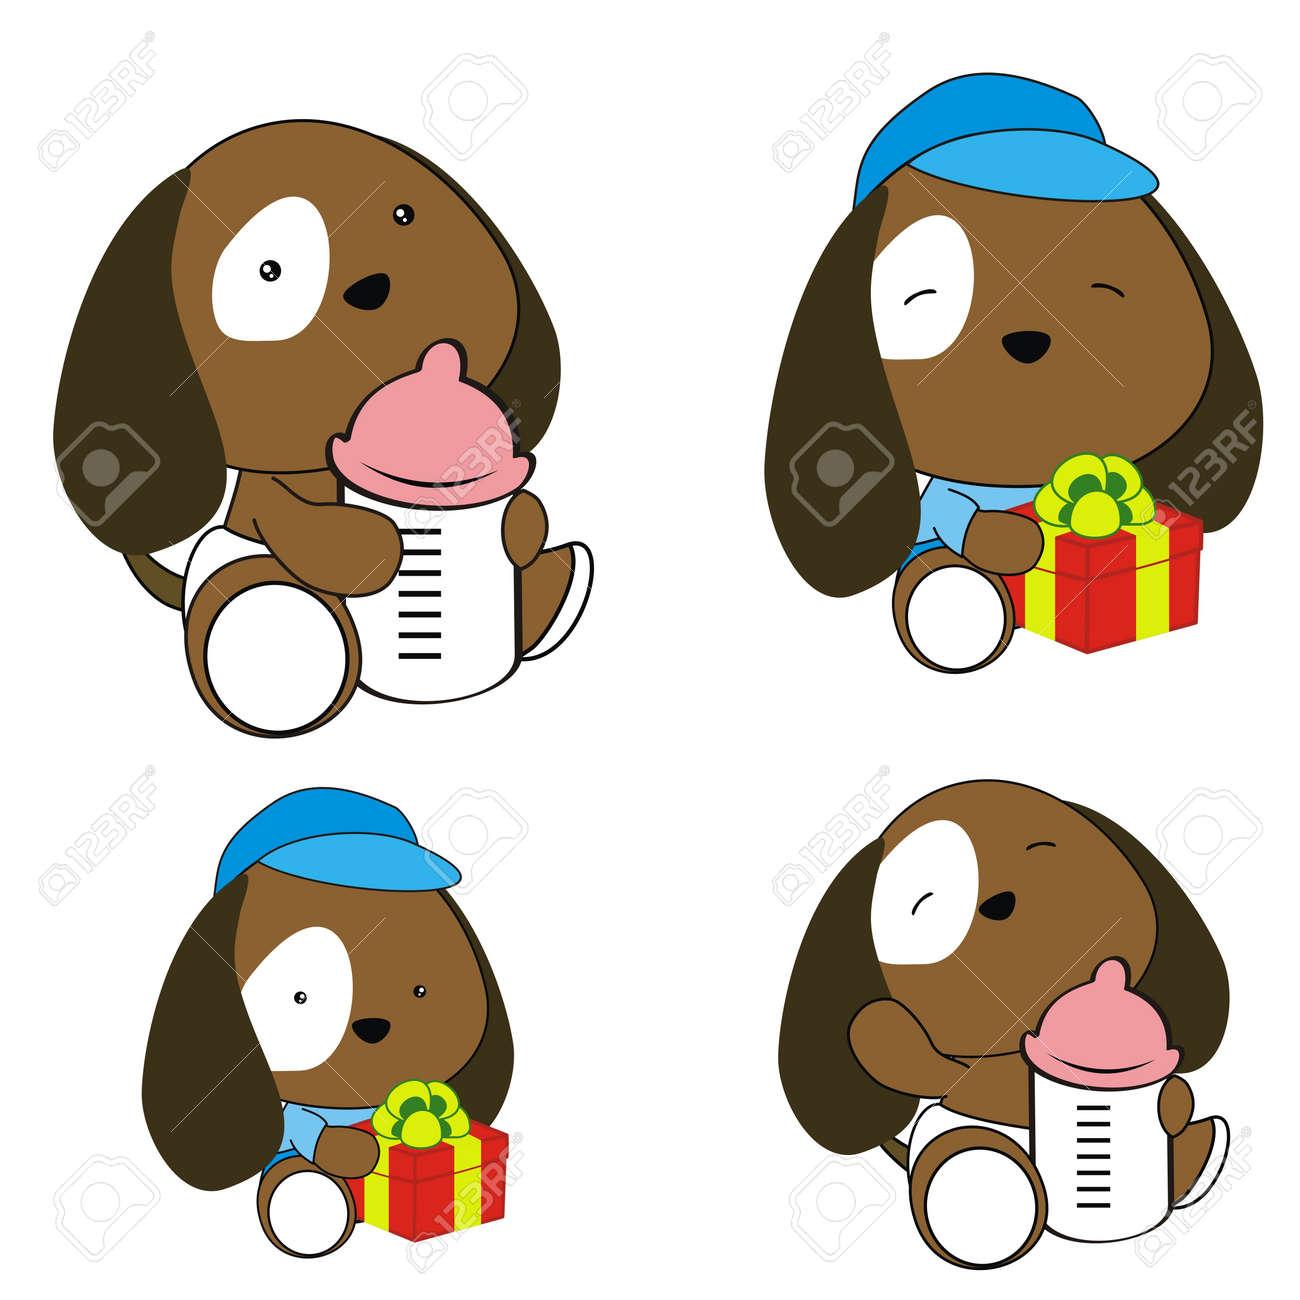 puppy baby diaper cartoon set royalty free cliparts vectors and rh 123rf com Cute Puppy Clip Art Sleeping Puppy Clip Art